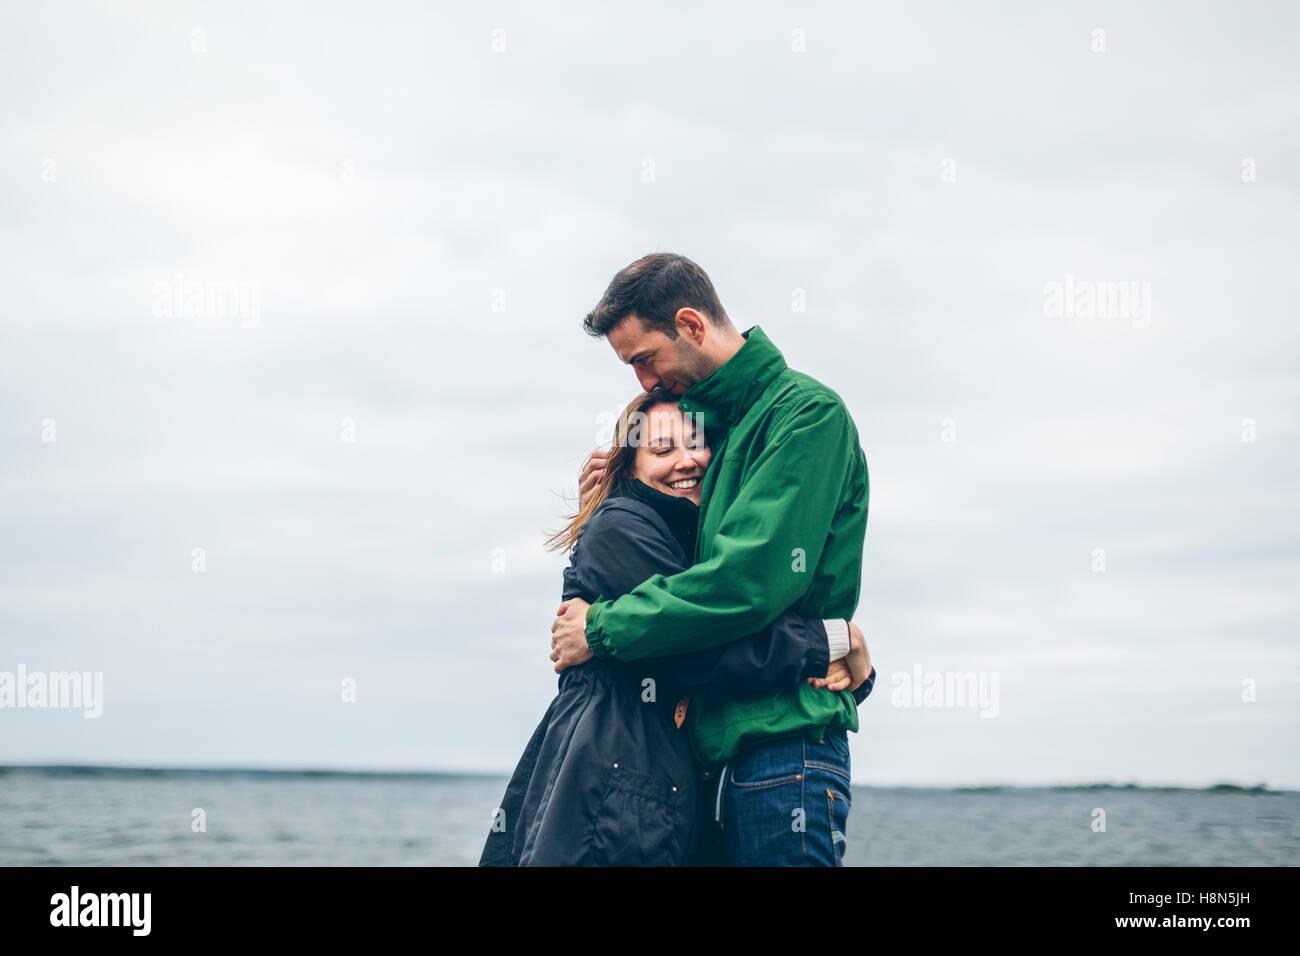 Pareja abrazándose Imagen De Stock